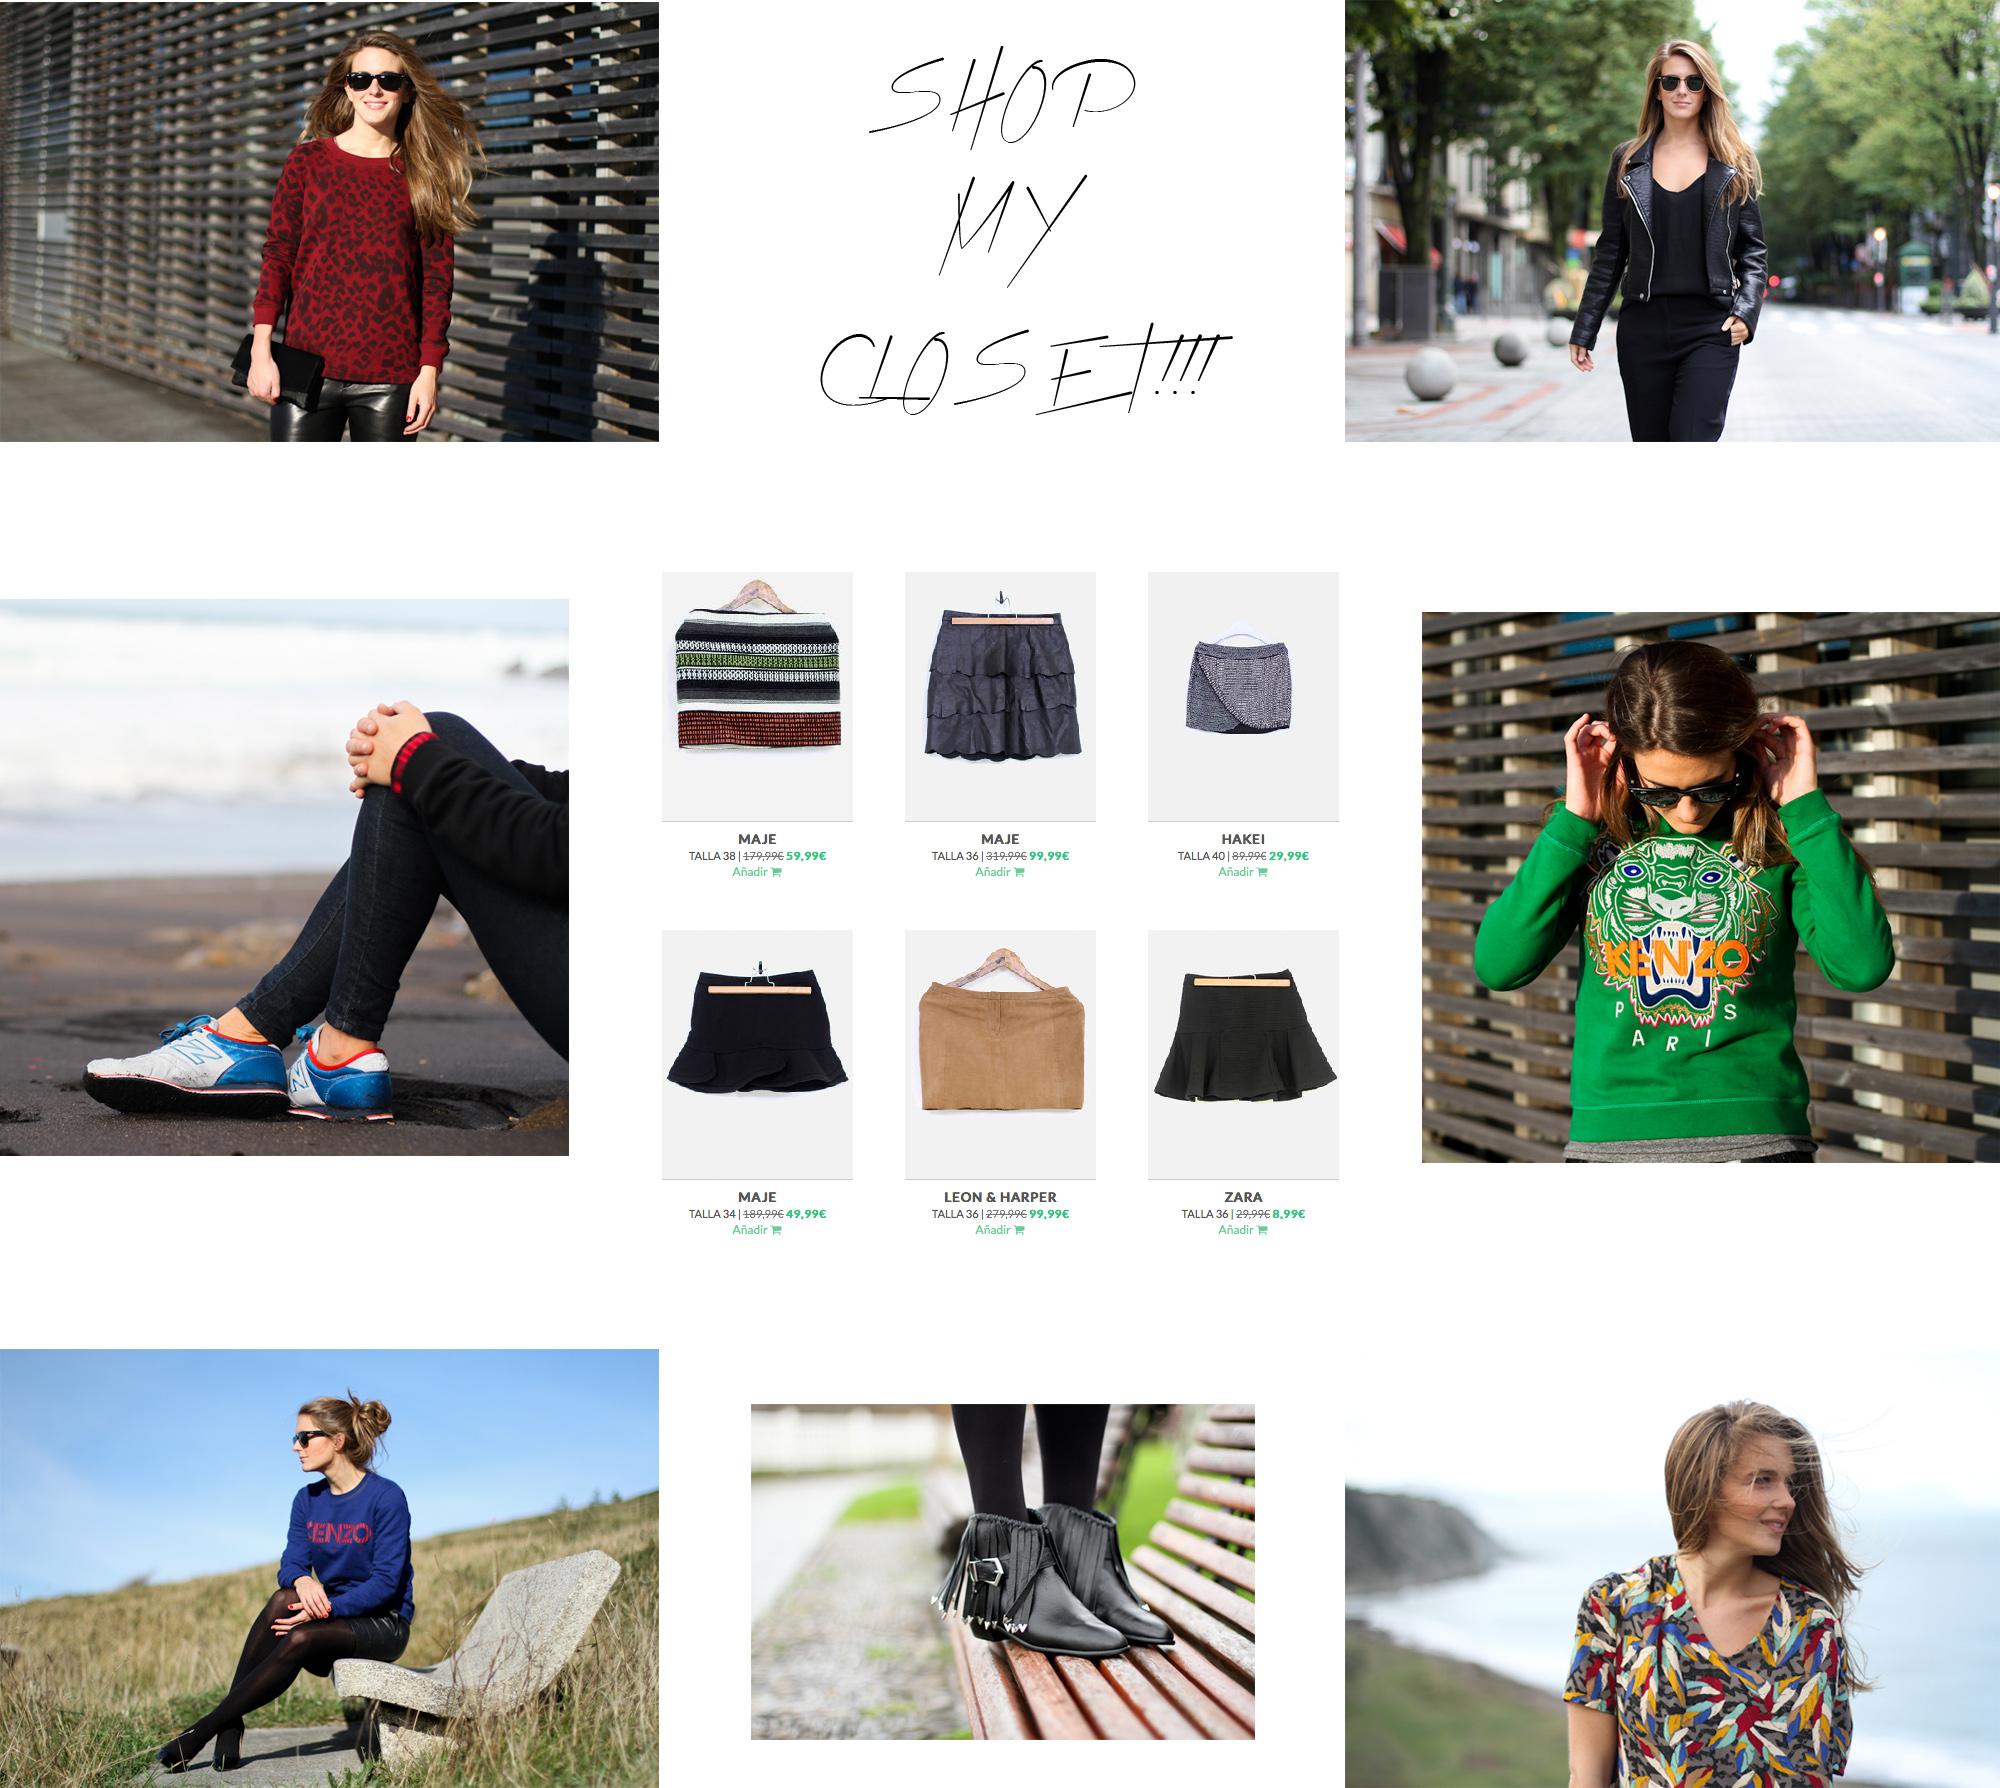 Clochet_shop_my_closet_micolet_03